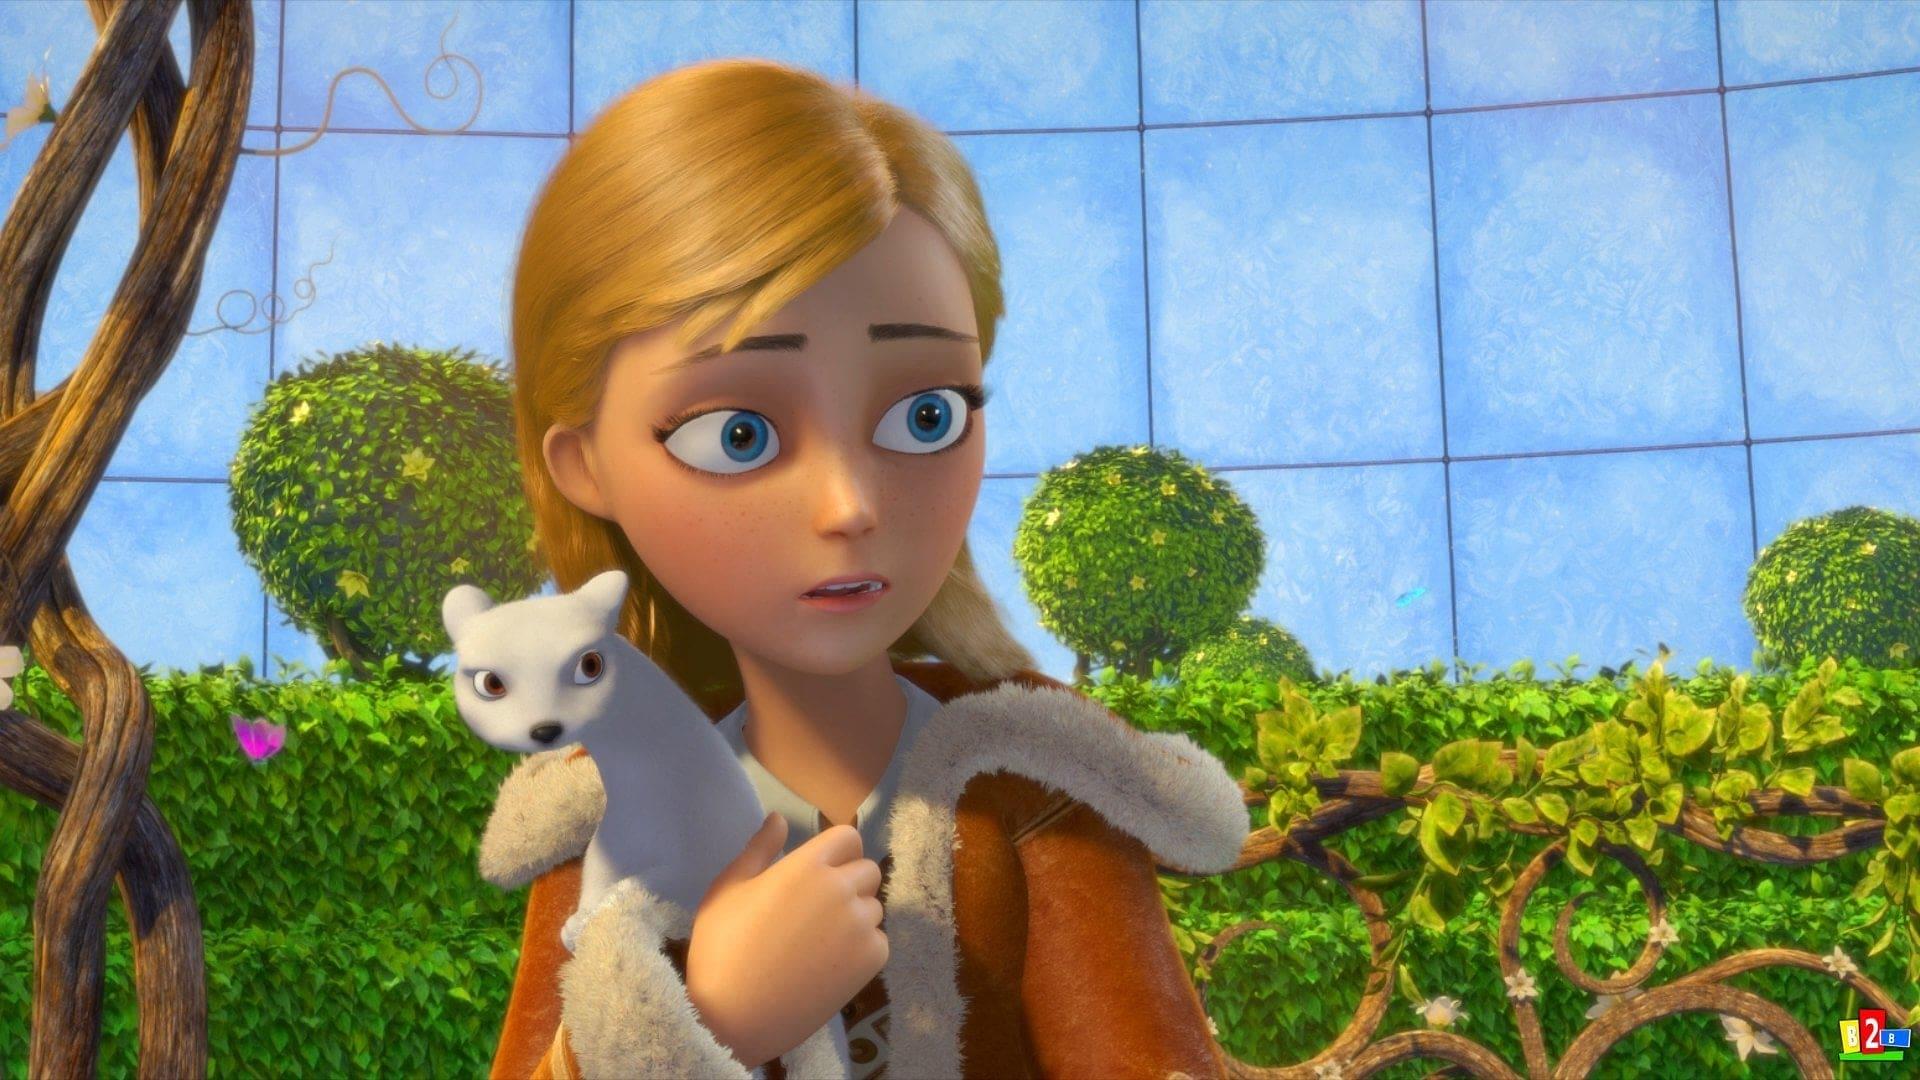 Regarder The Snow Queen – La Reine des Neiges en streaming gratuit